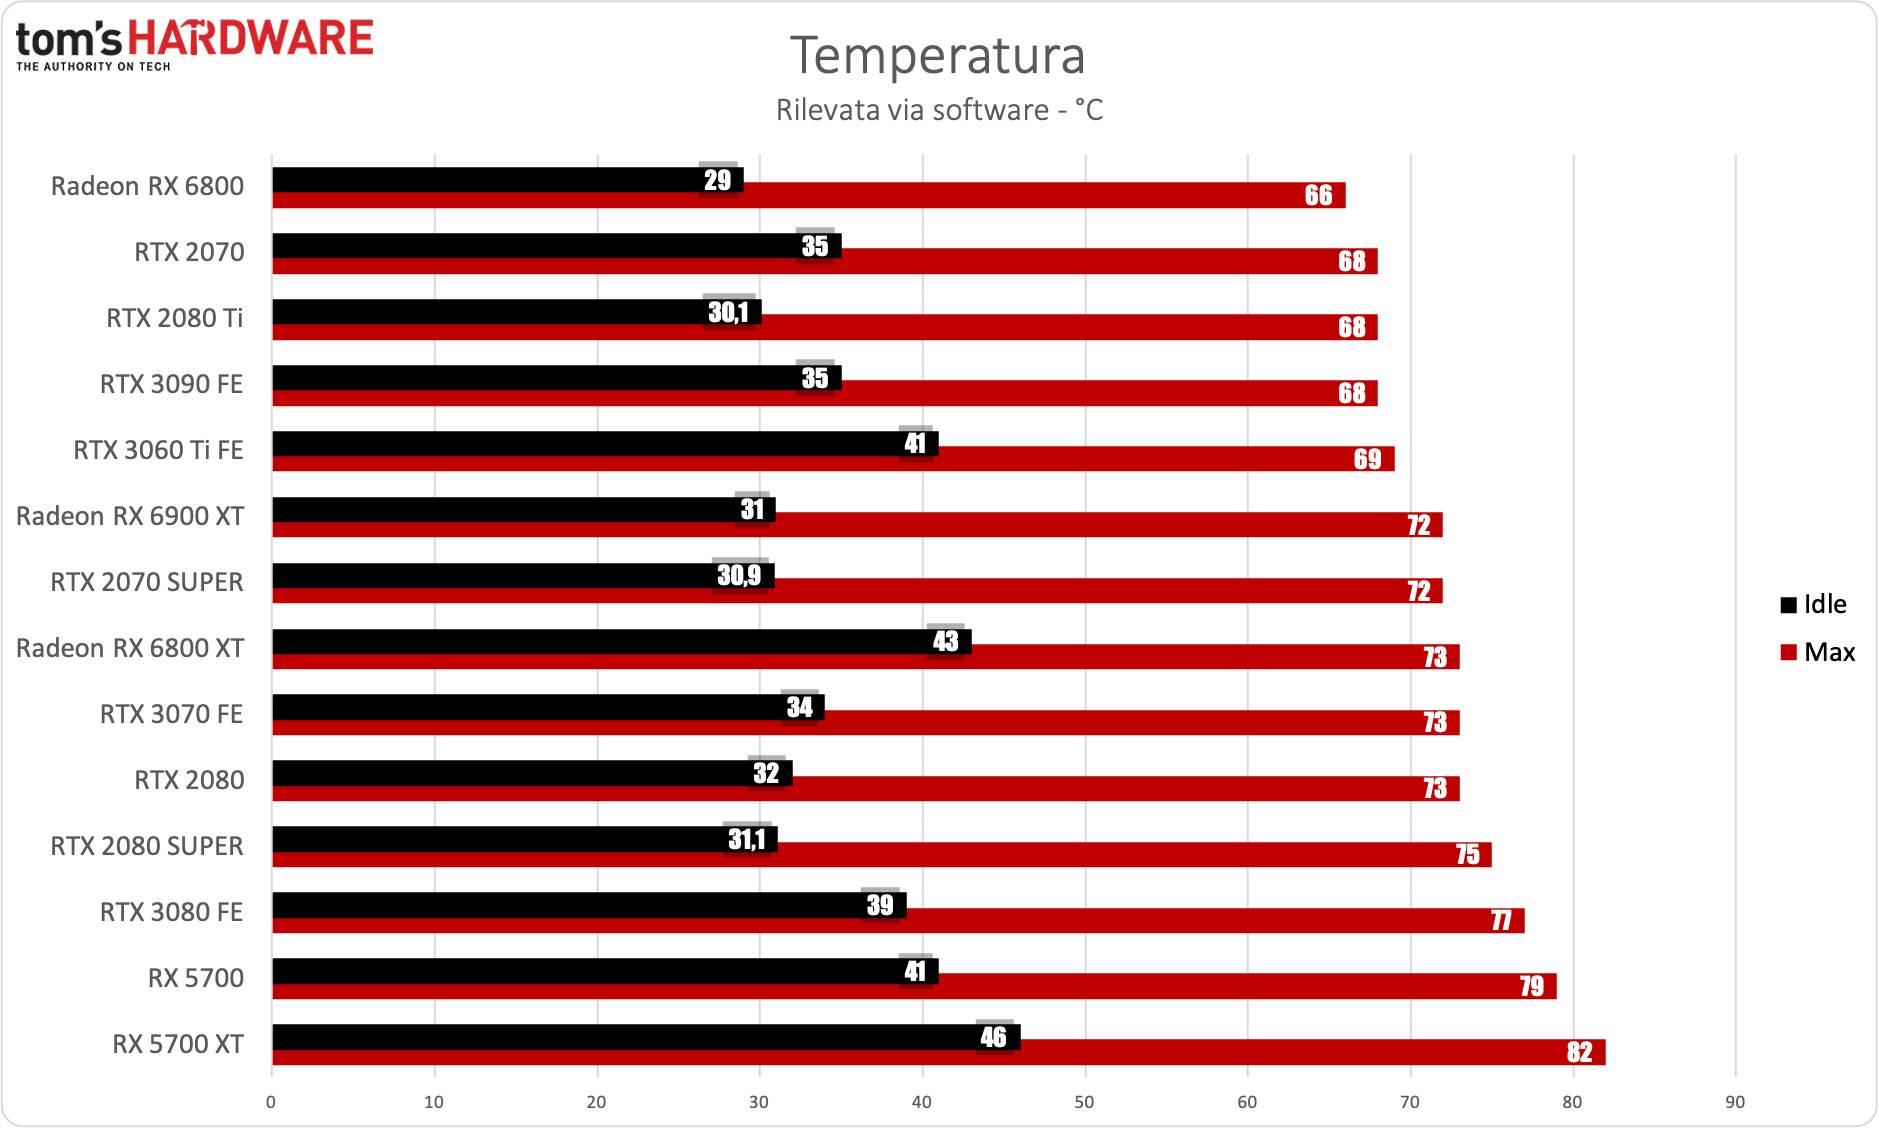 Benchmark Radeon RX 6900 XT - Temperatura